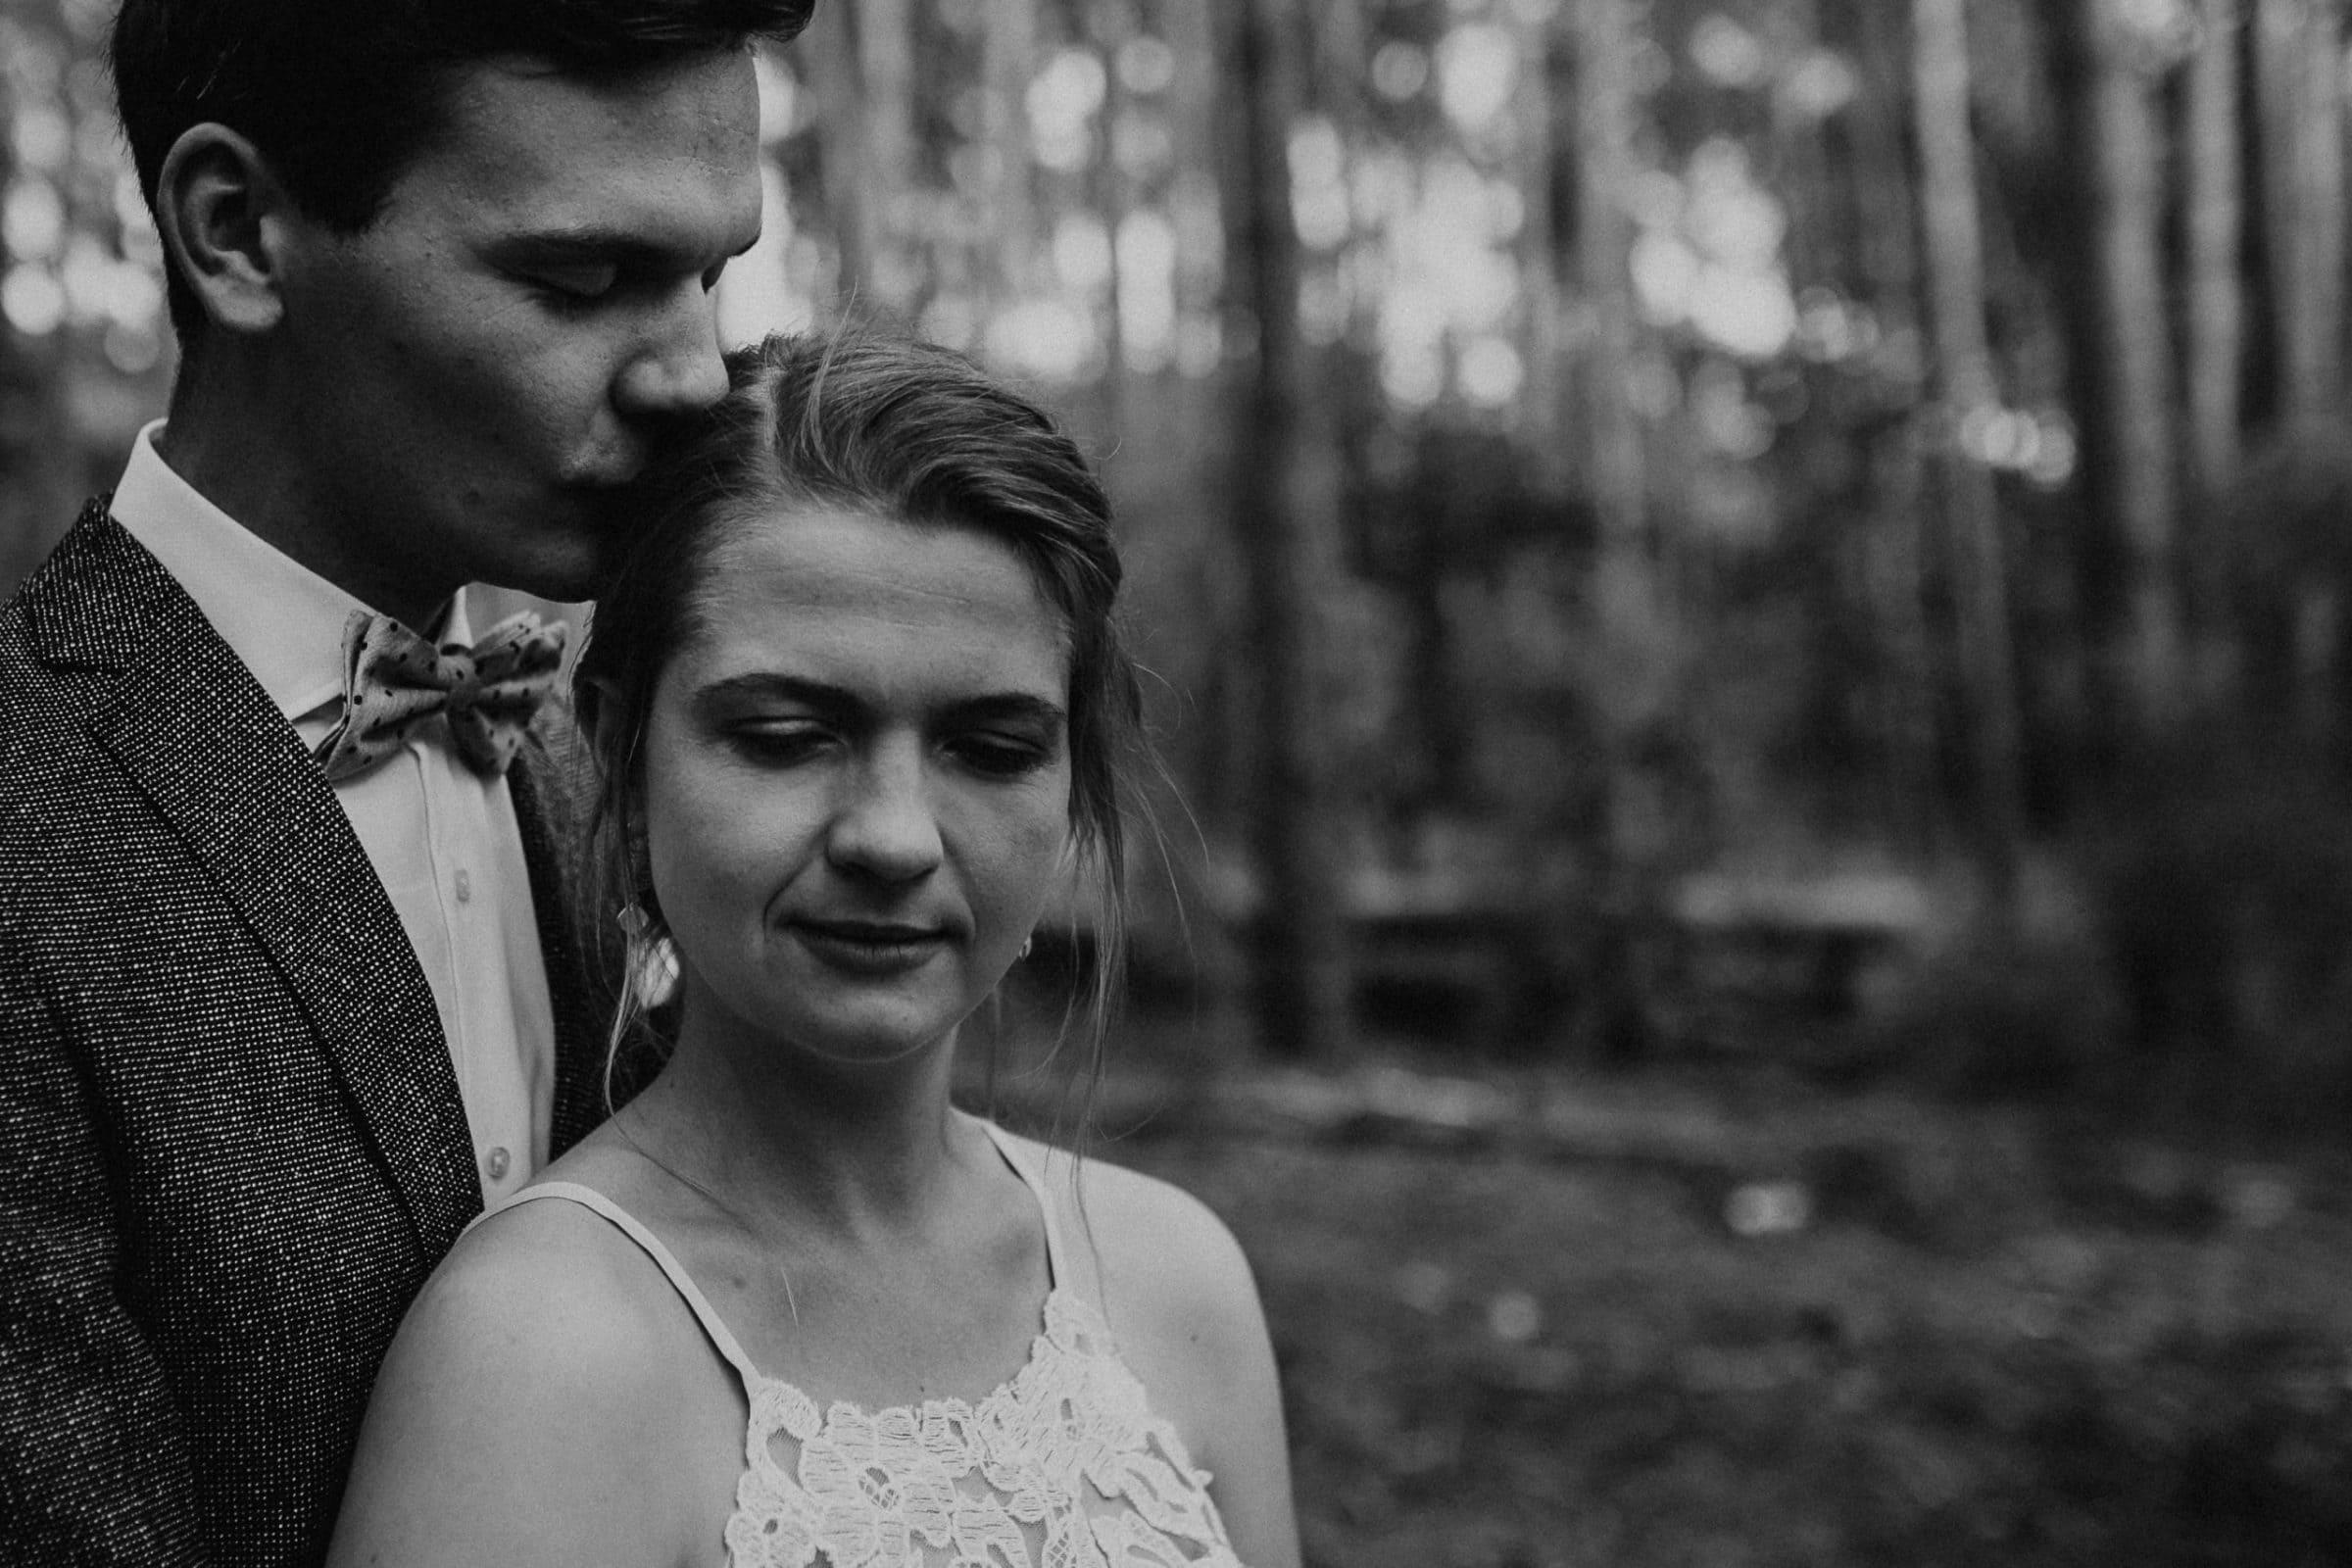 Hochzeit berlin, mühle tornow, muehle tornow, tornow, paarshooting, couple shooting, hochzeitsfotograf berlin, wedding couple shooting, forest, wald, forest couple shooting